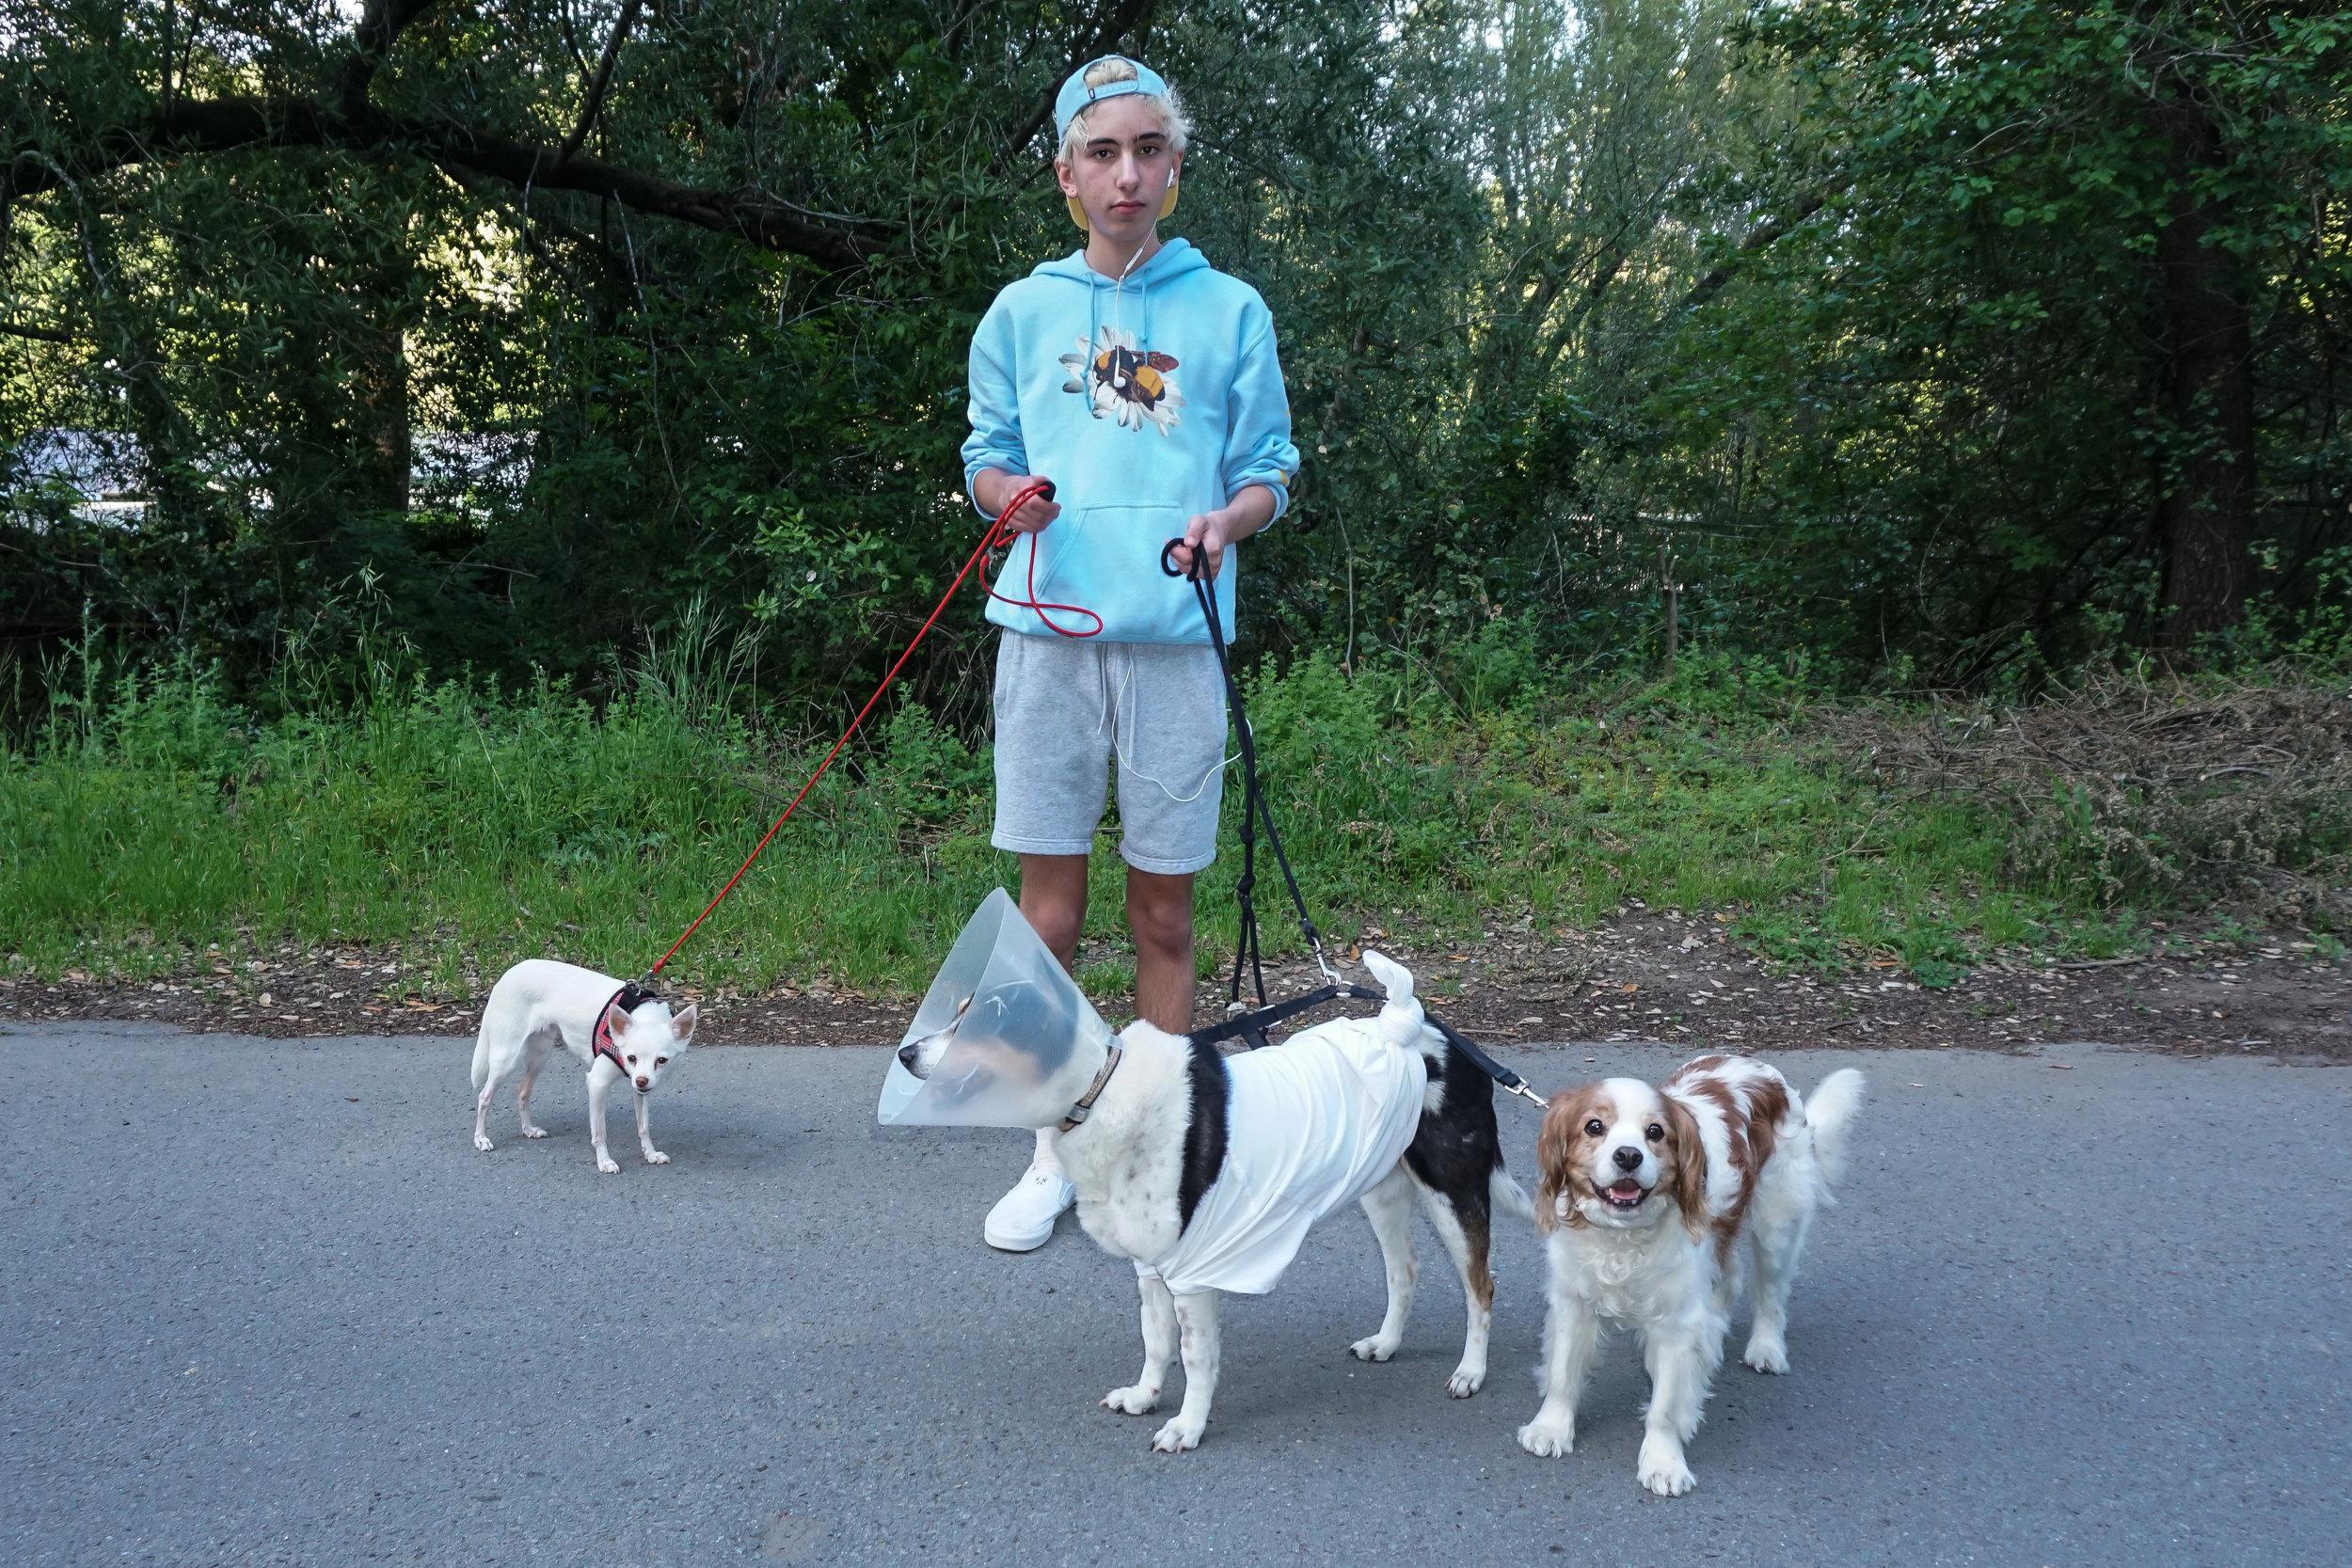 Dog-guy-6bbb-03678.jpg